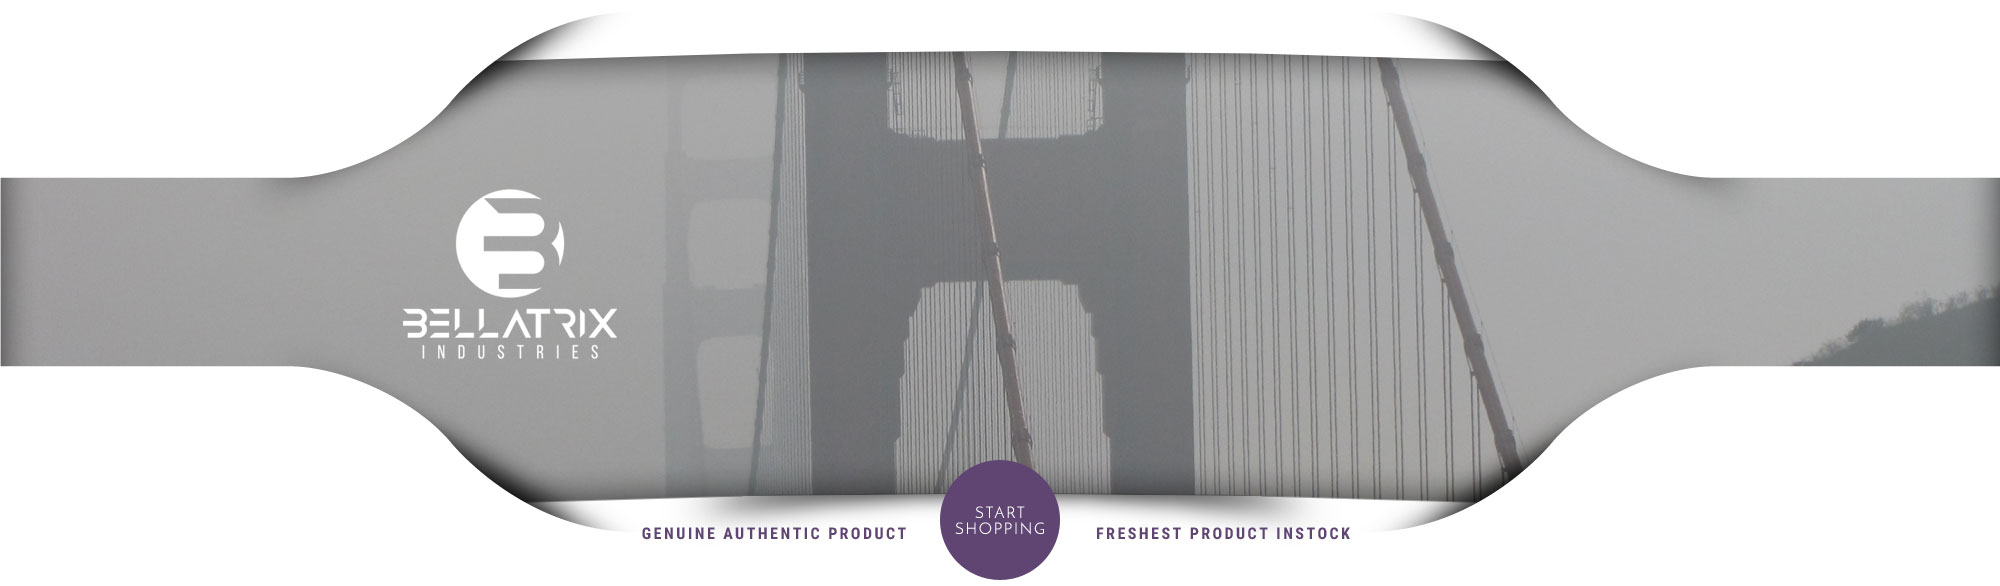 Bellatrix -   Genuine Authentic Product - Freshest Product Instock  - start shopping